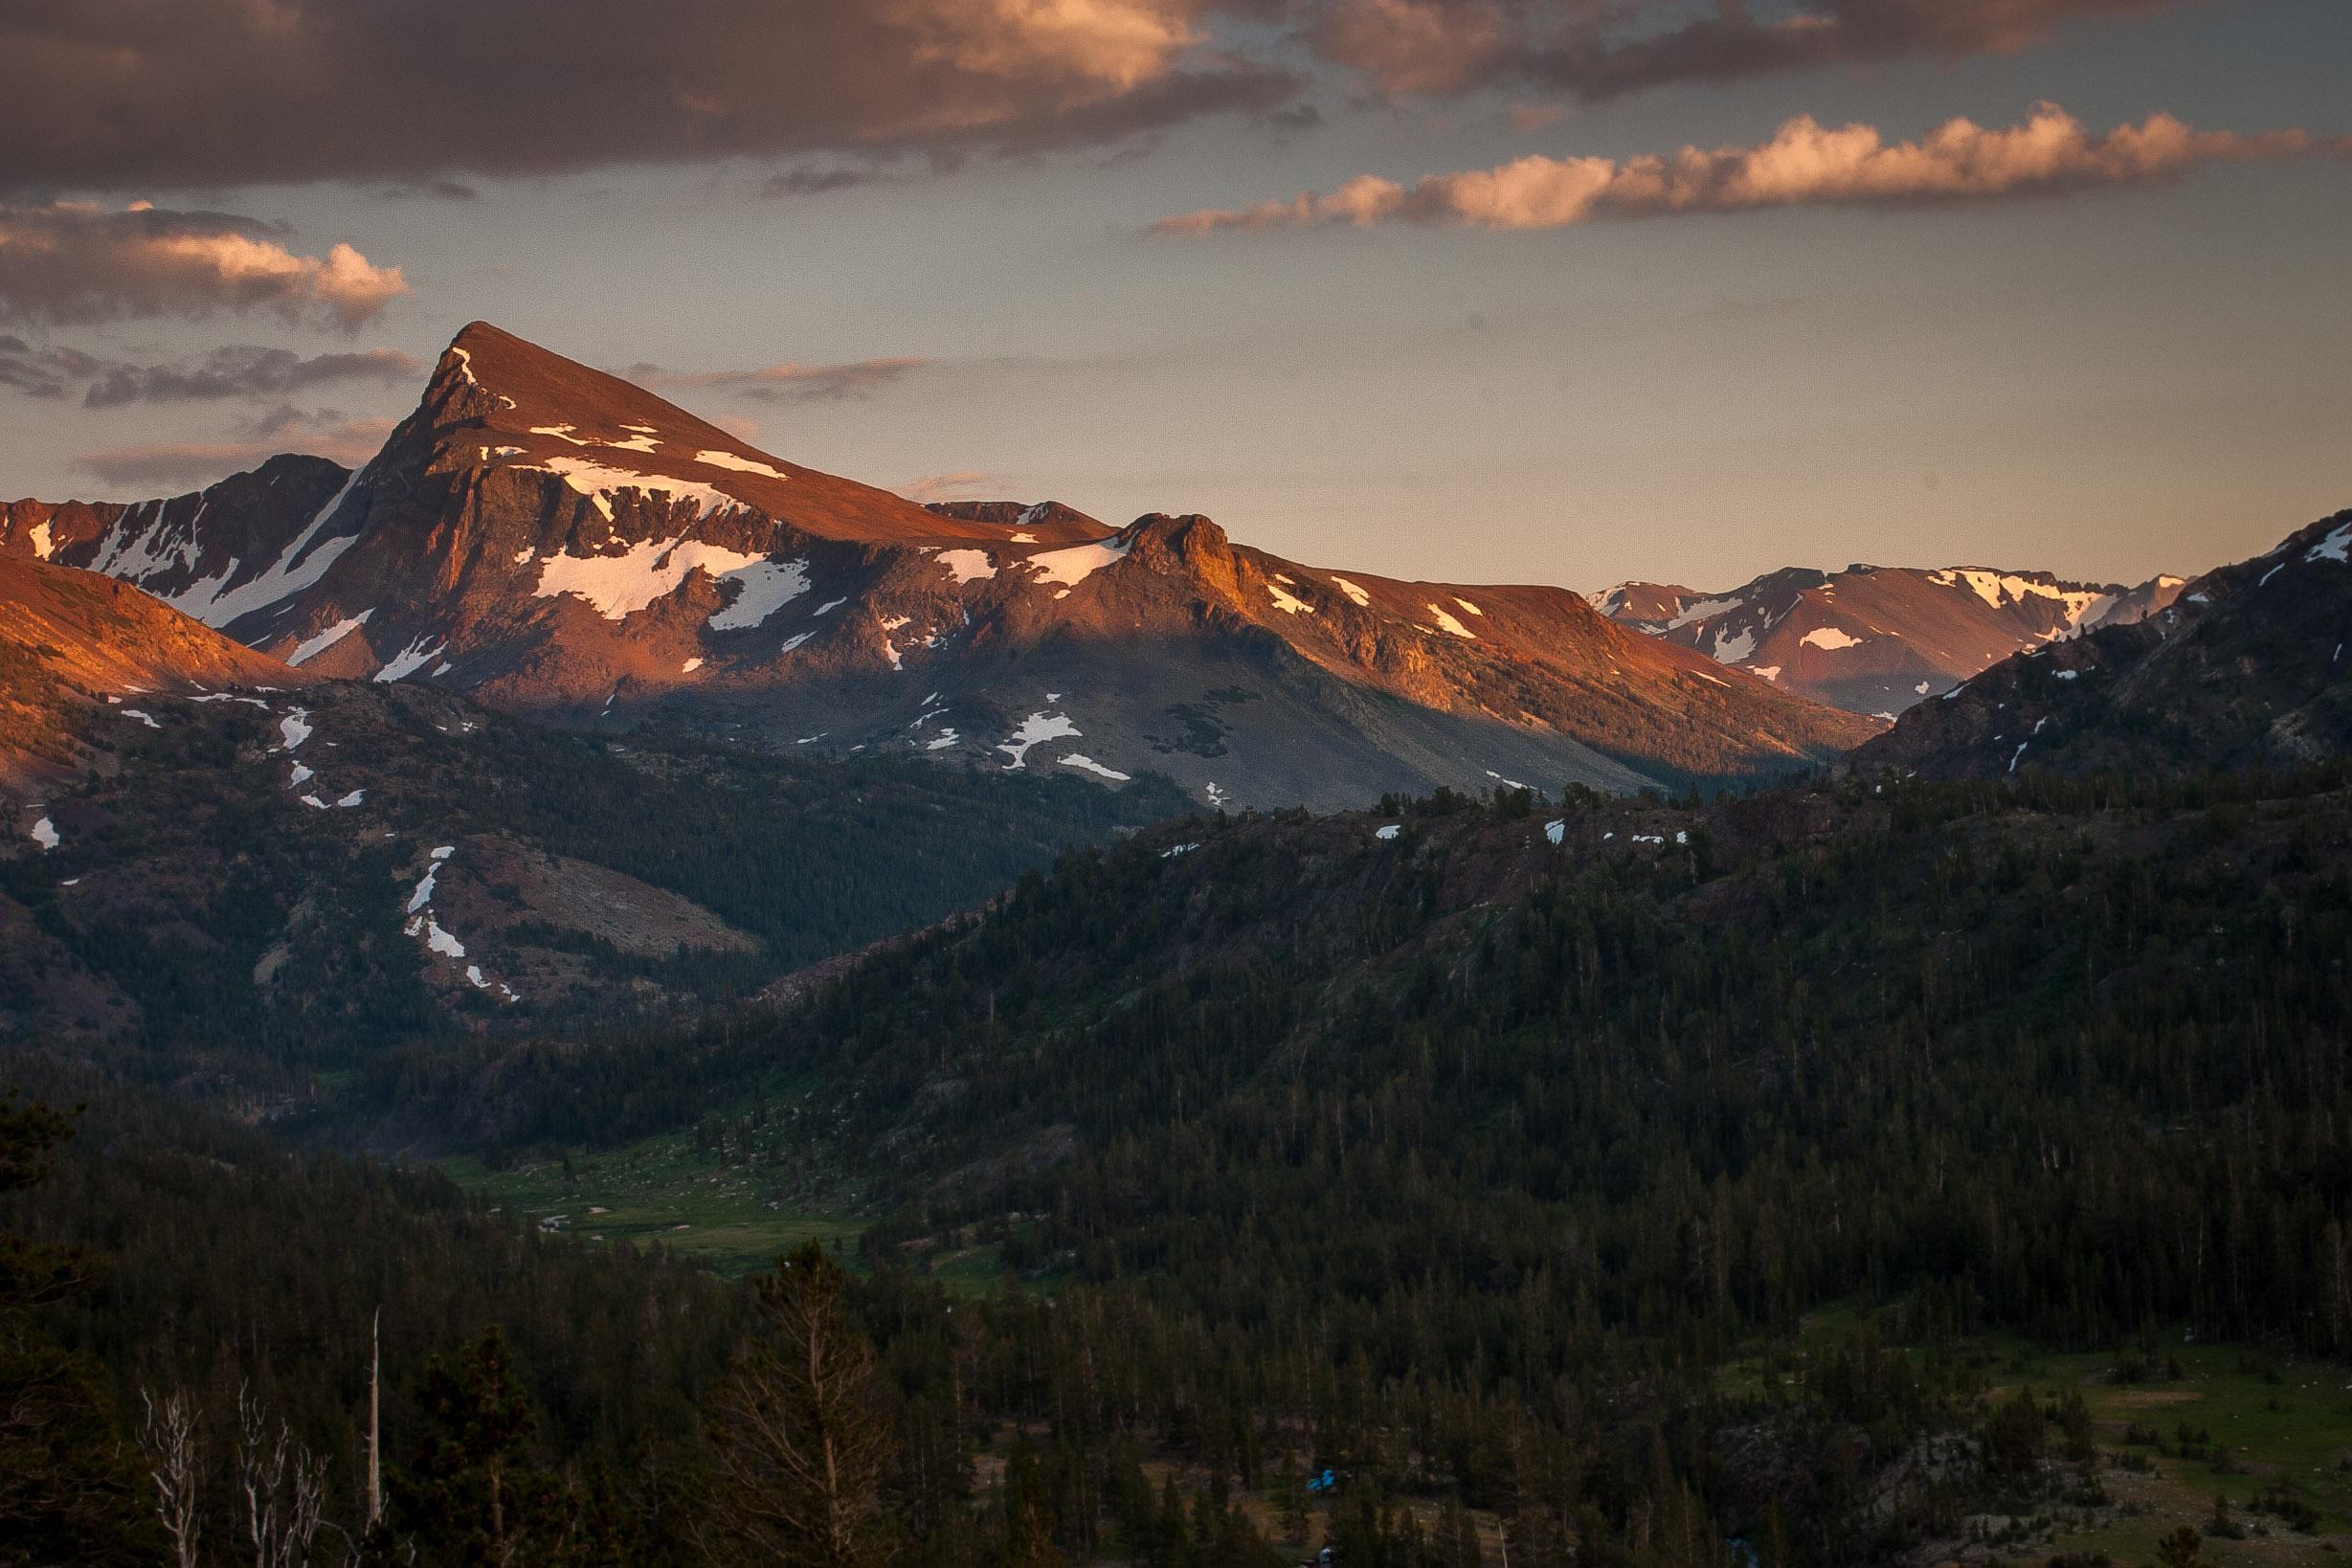 Yosemite_at_sunset.jpg